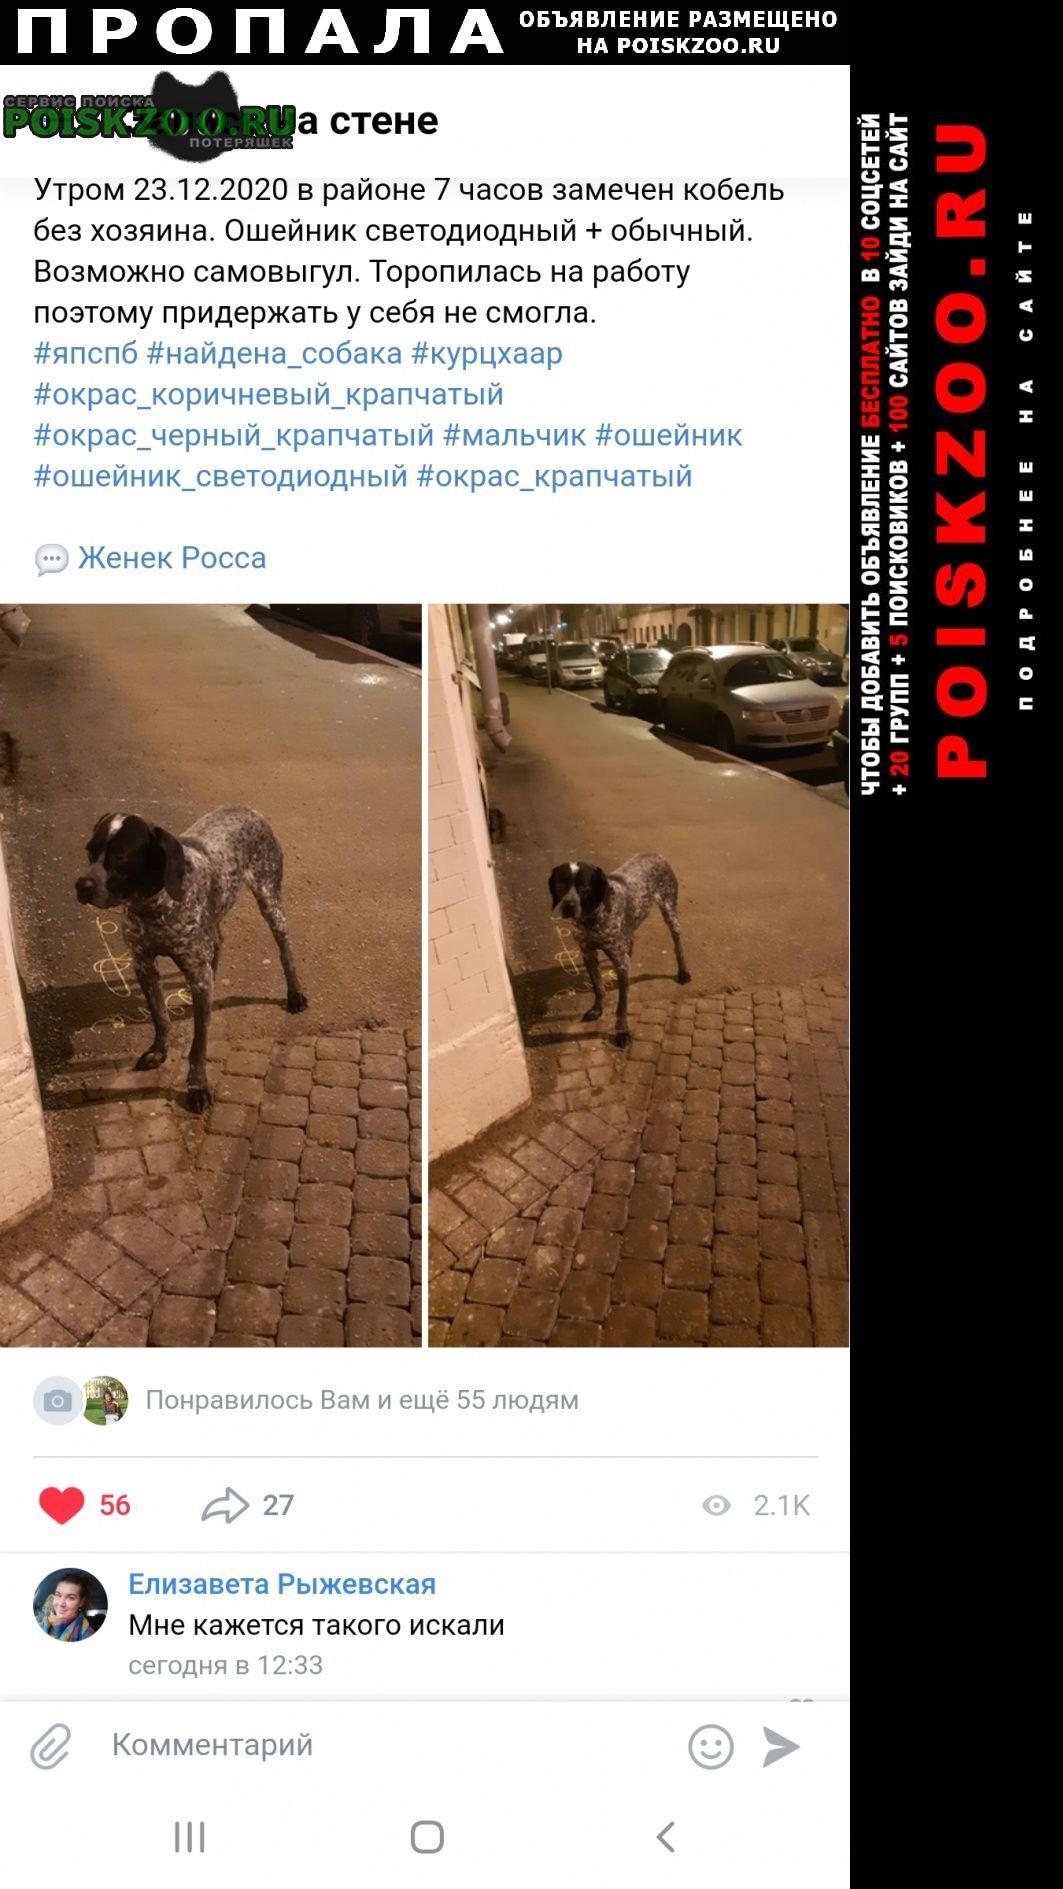 Пропала собака 22 декабря 2020 Санкт-Петербург